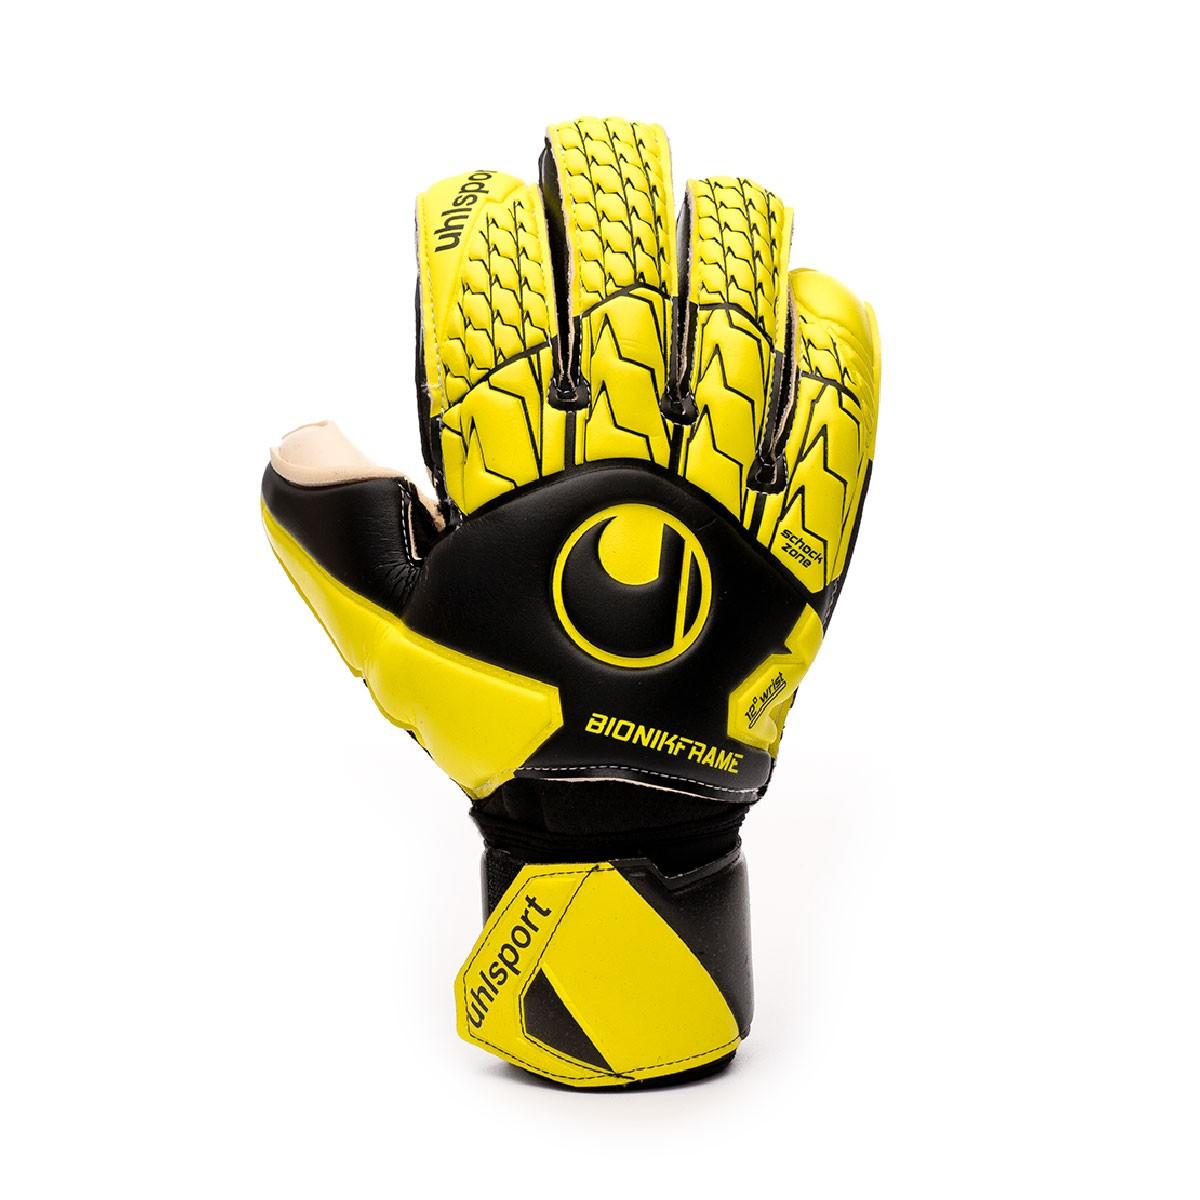 3b9136e44 Glove Uhlsport Absolutgrip Bionik Black-Fluor yellow - Tienda de fútbol  Fútbol Emotion